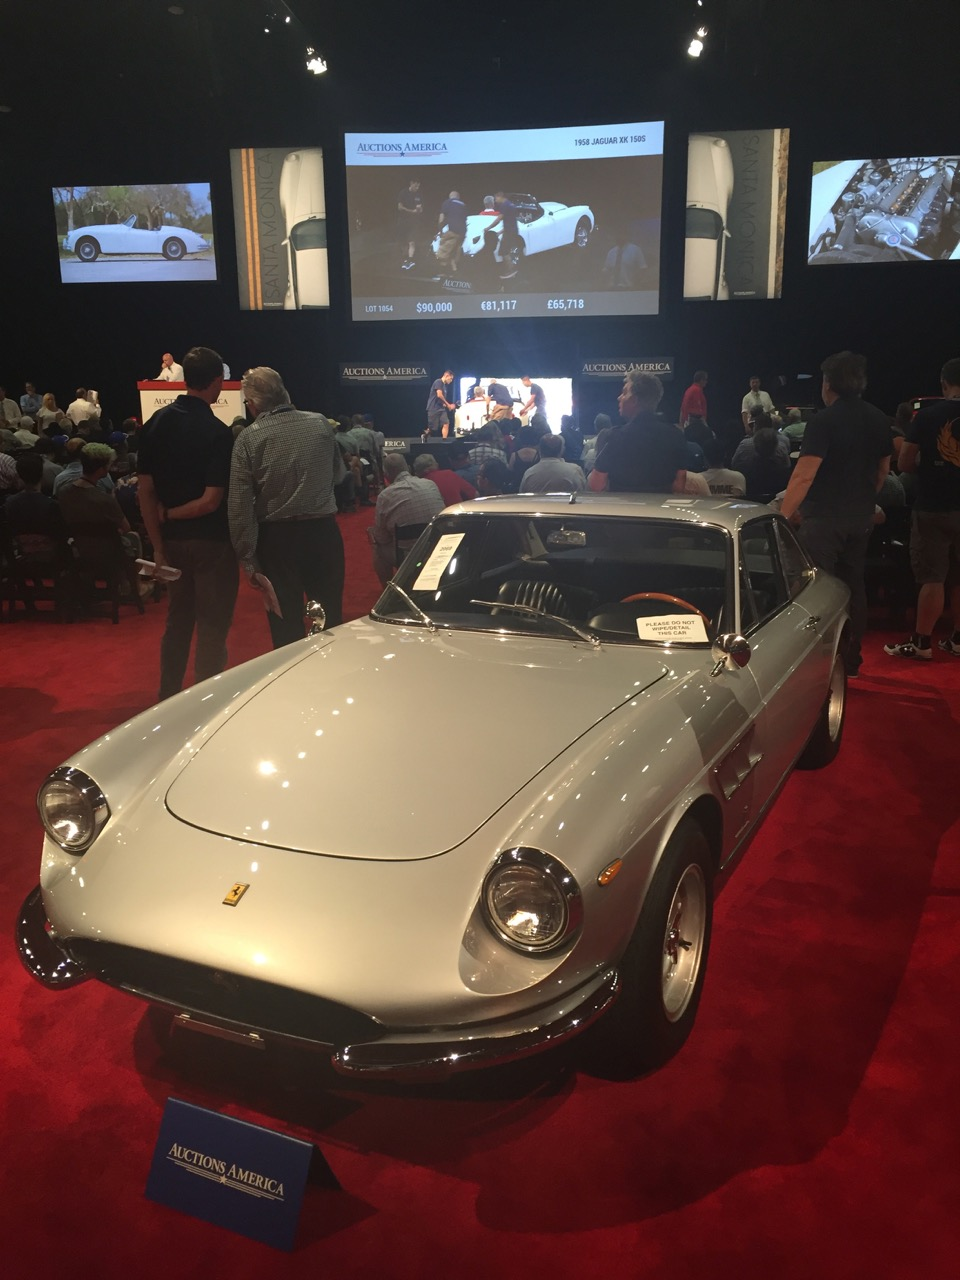 1966 Ferrari 330 GTC awaits its turn on the block | Larry Crane photos